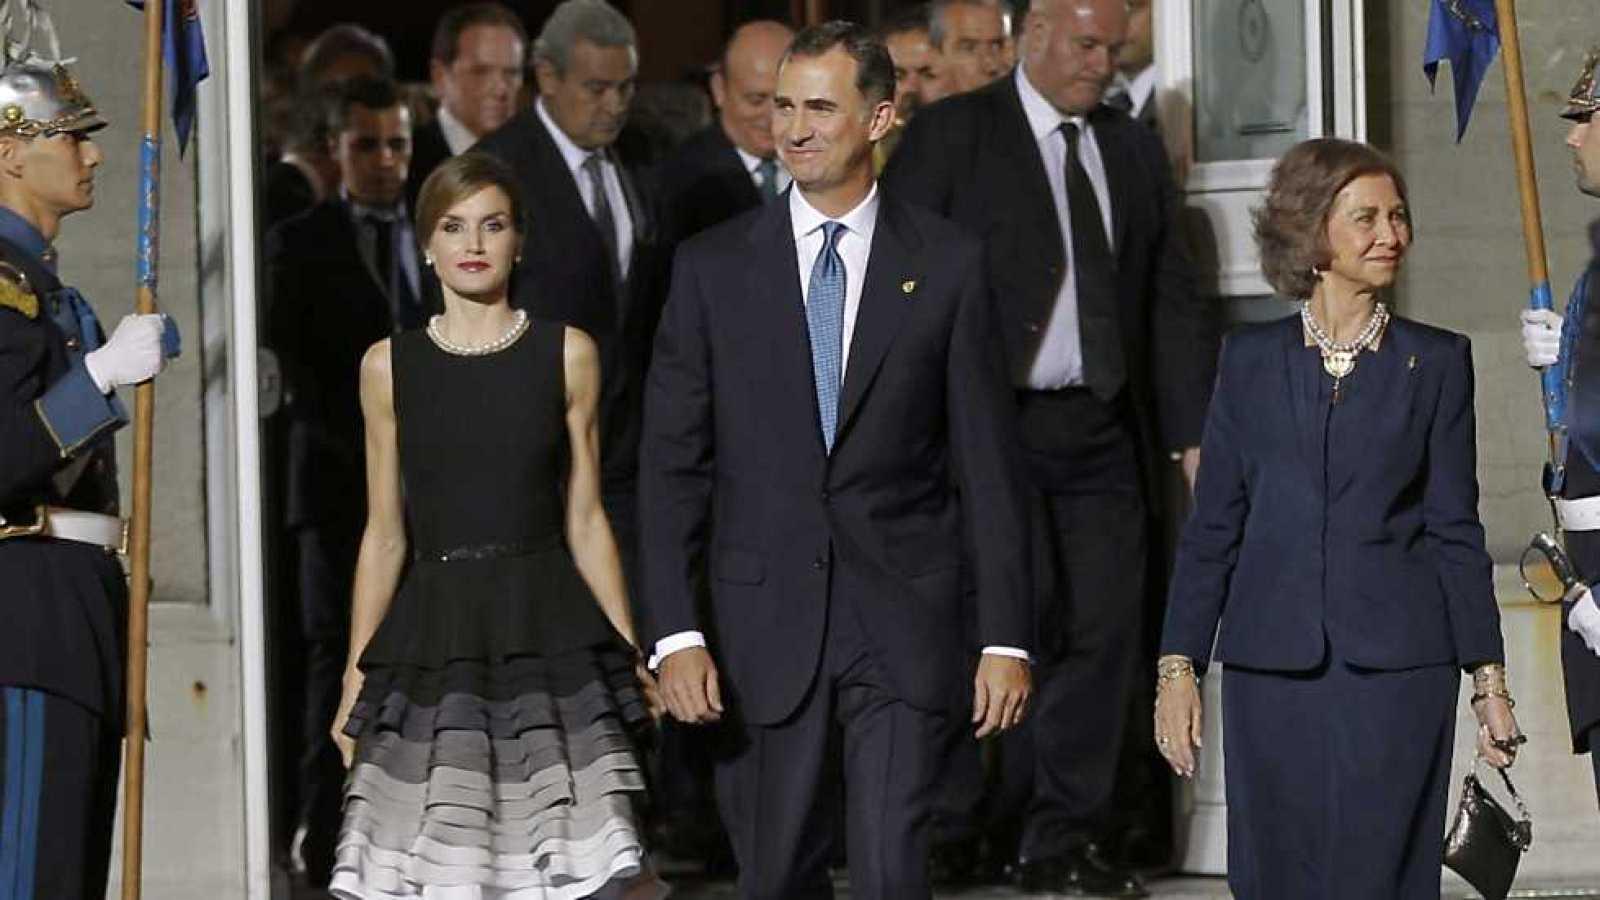 Telediario - 21 horas - 23/10/15 - RTVE.es